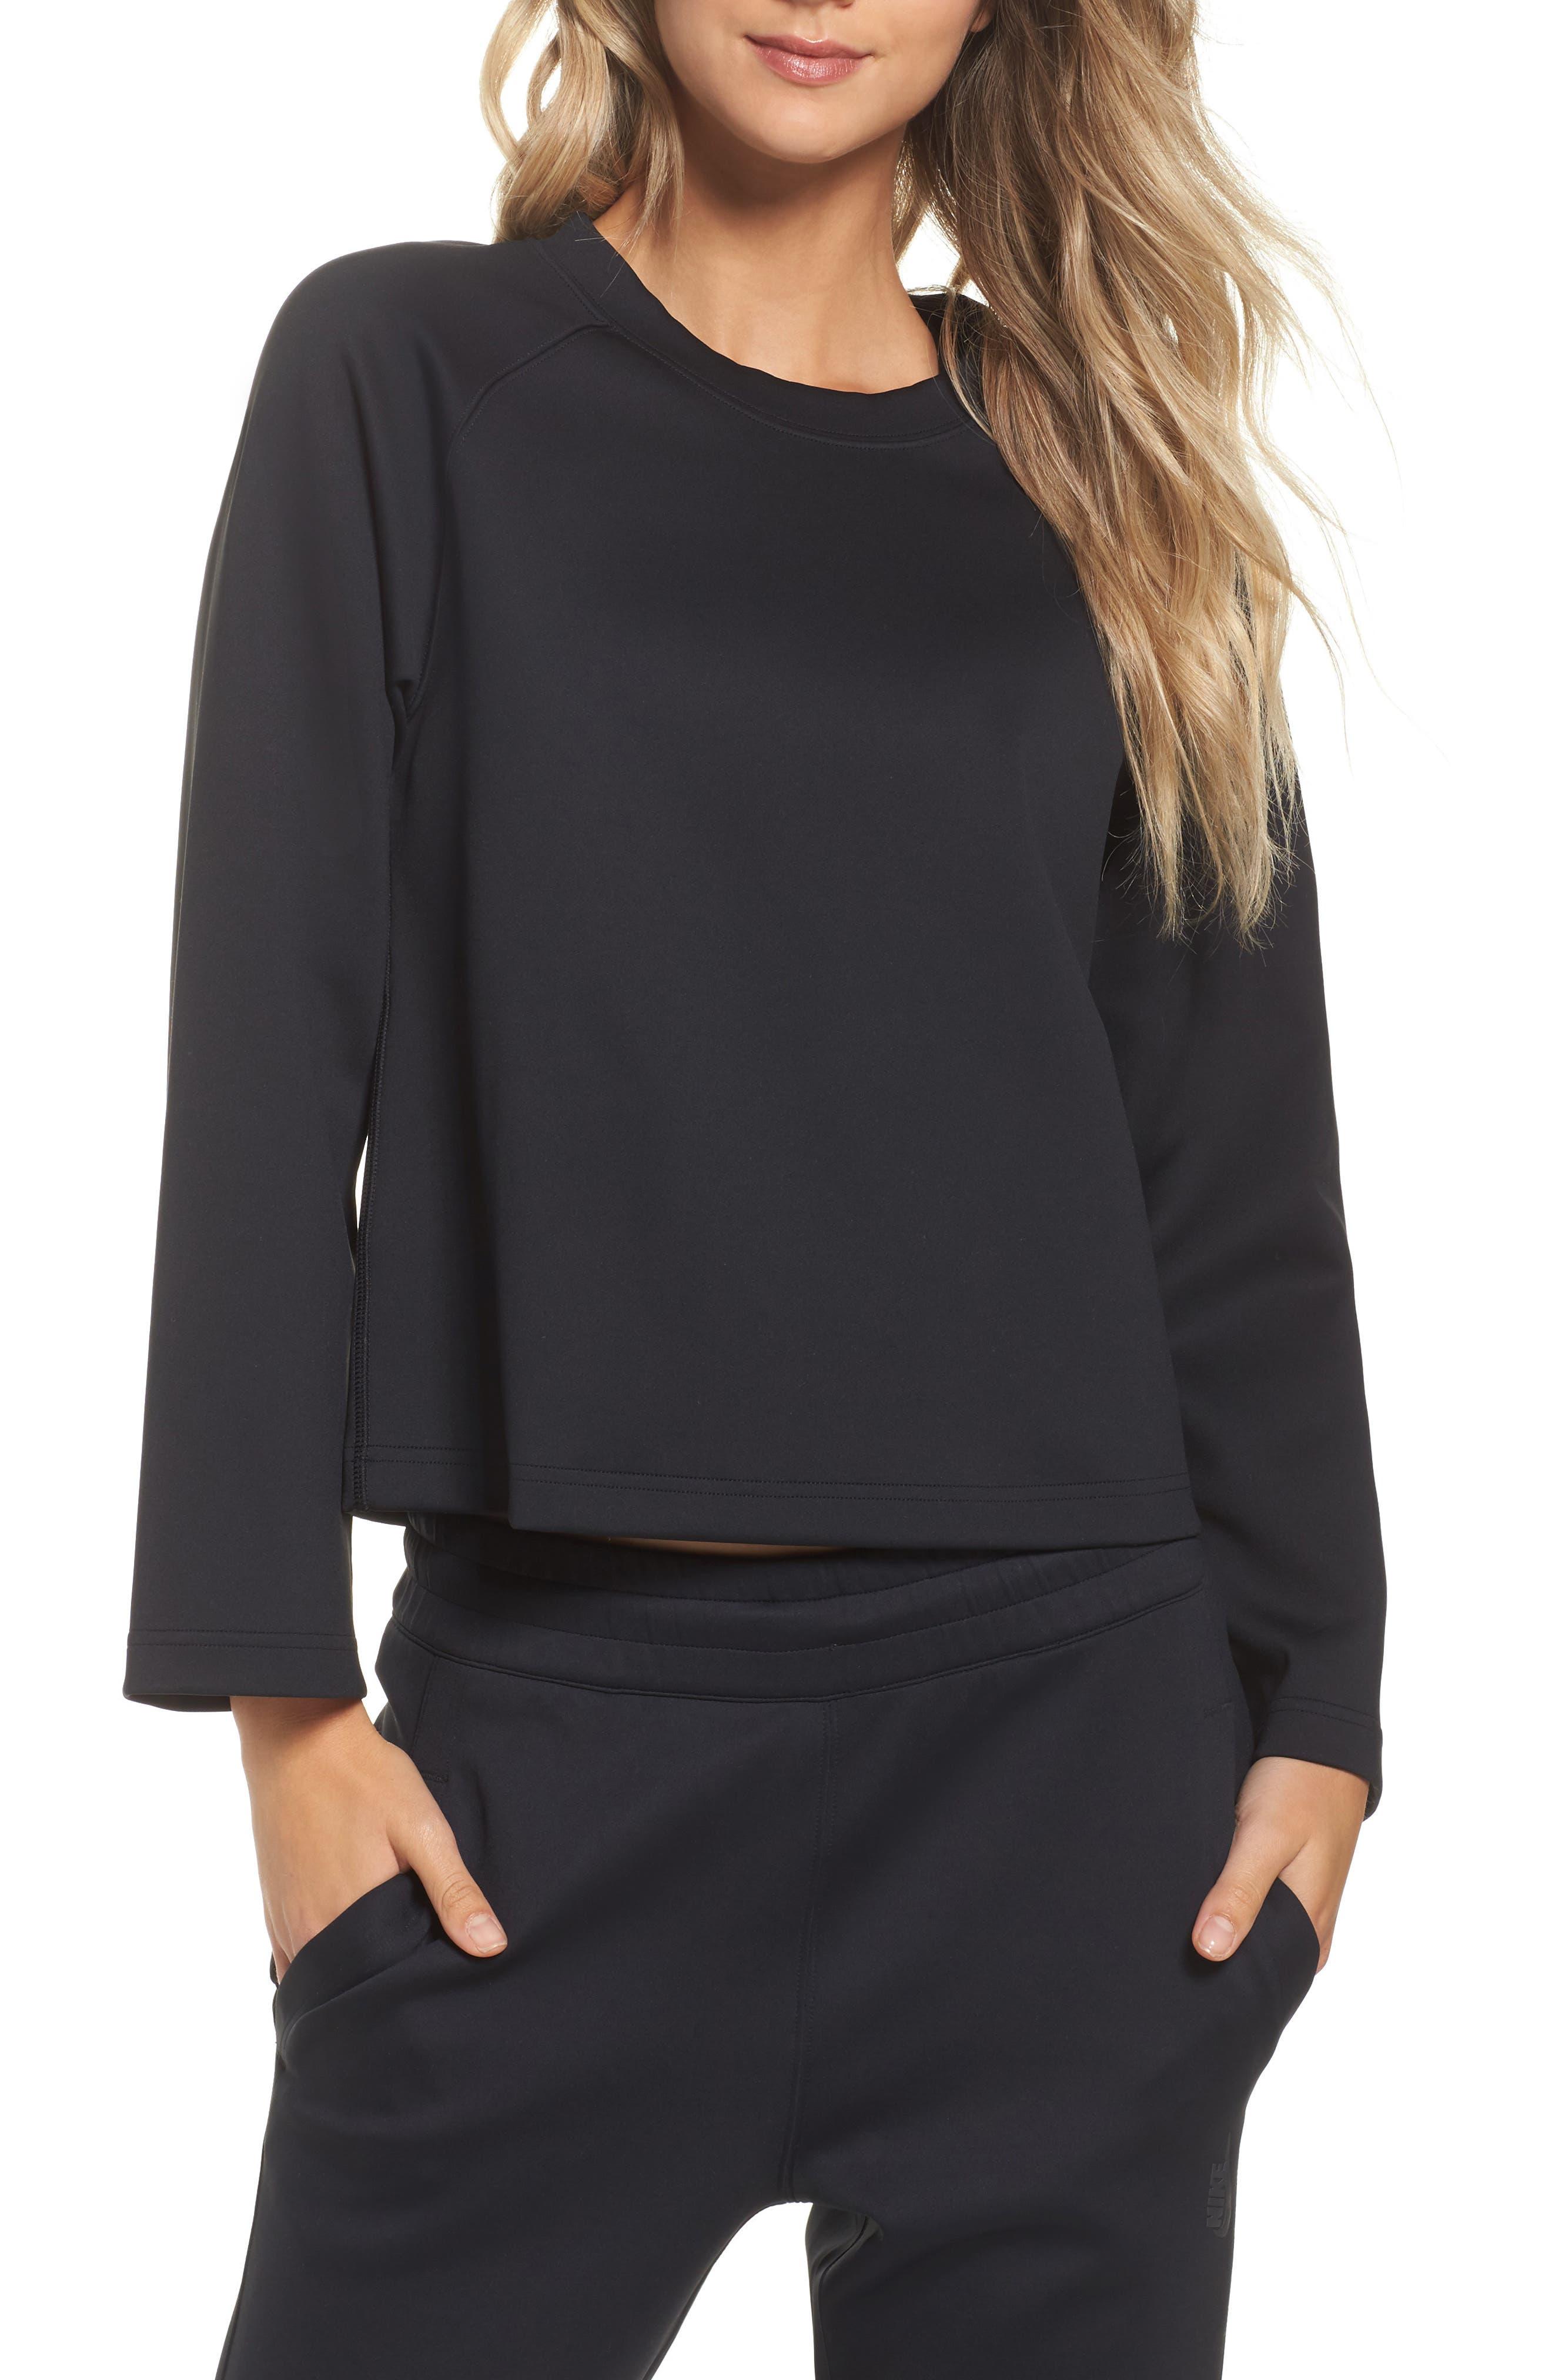 NikeLab Essentials Women's Fleece Top,                             Main thumbnail 1, color,